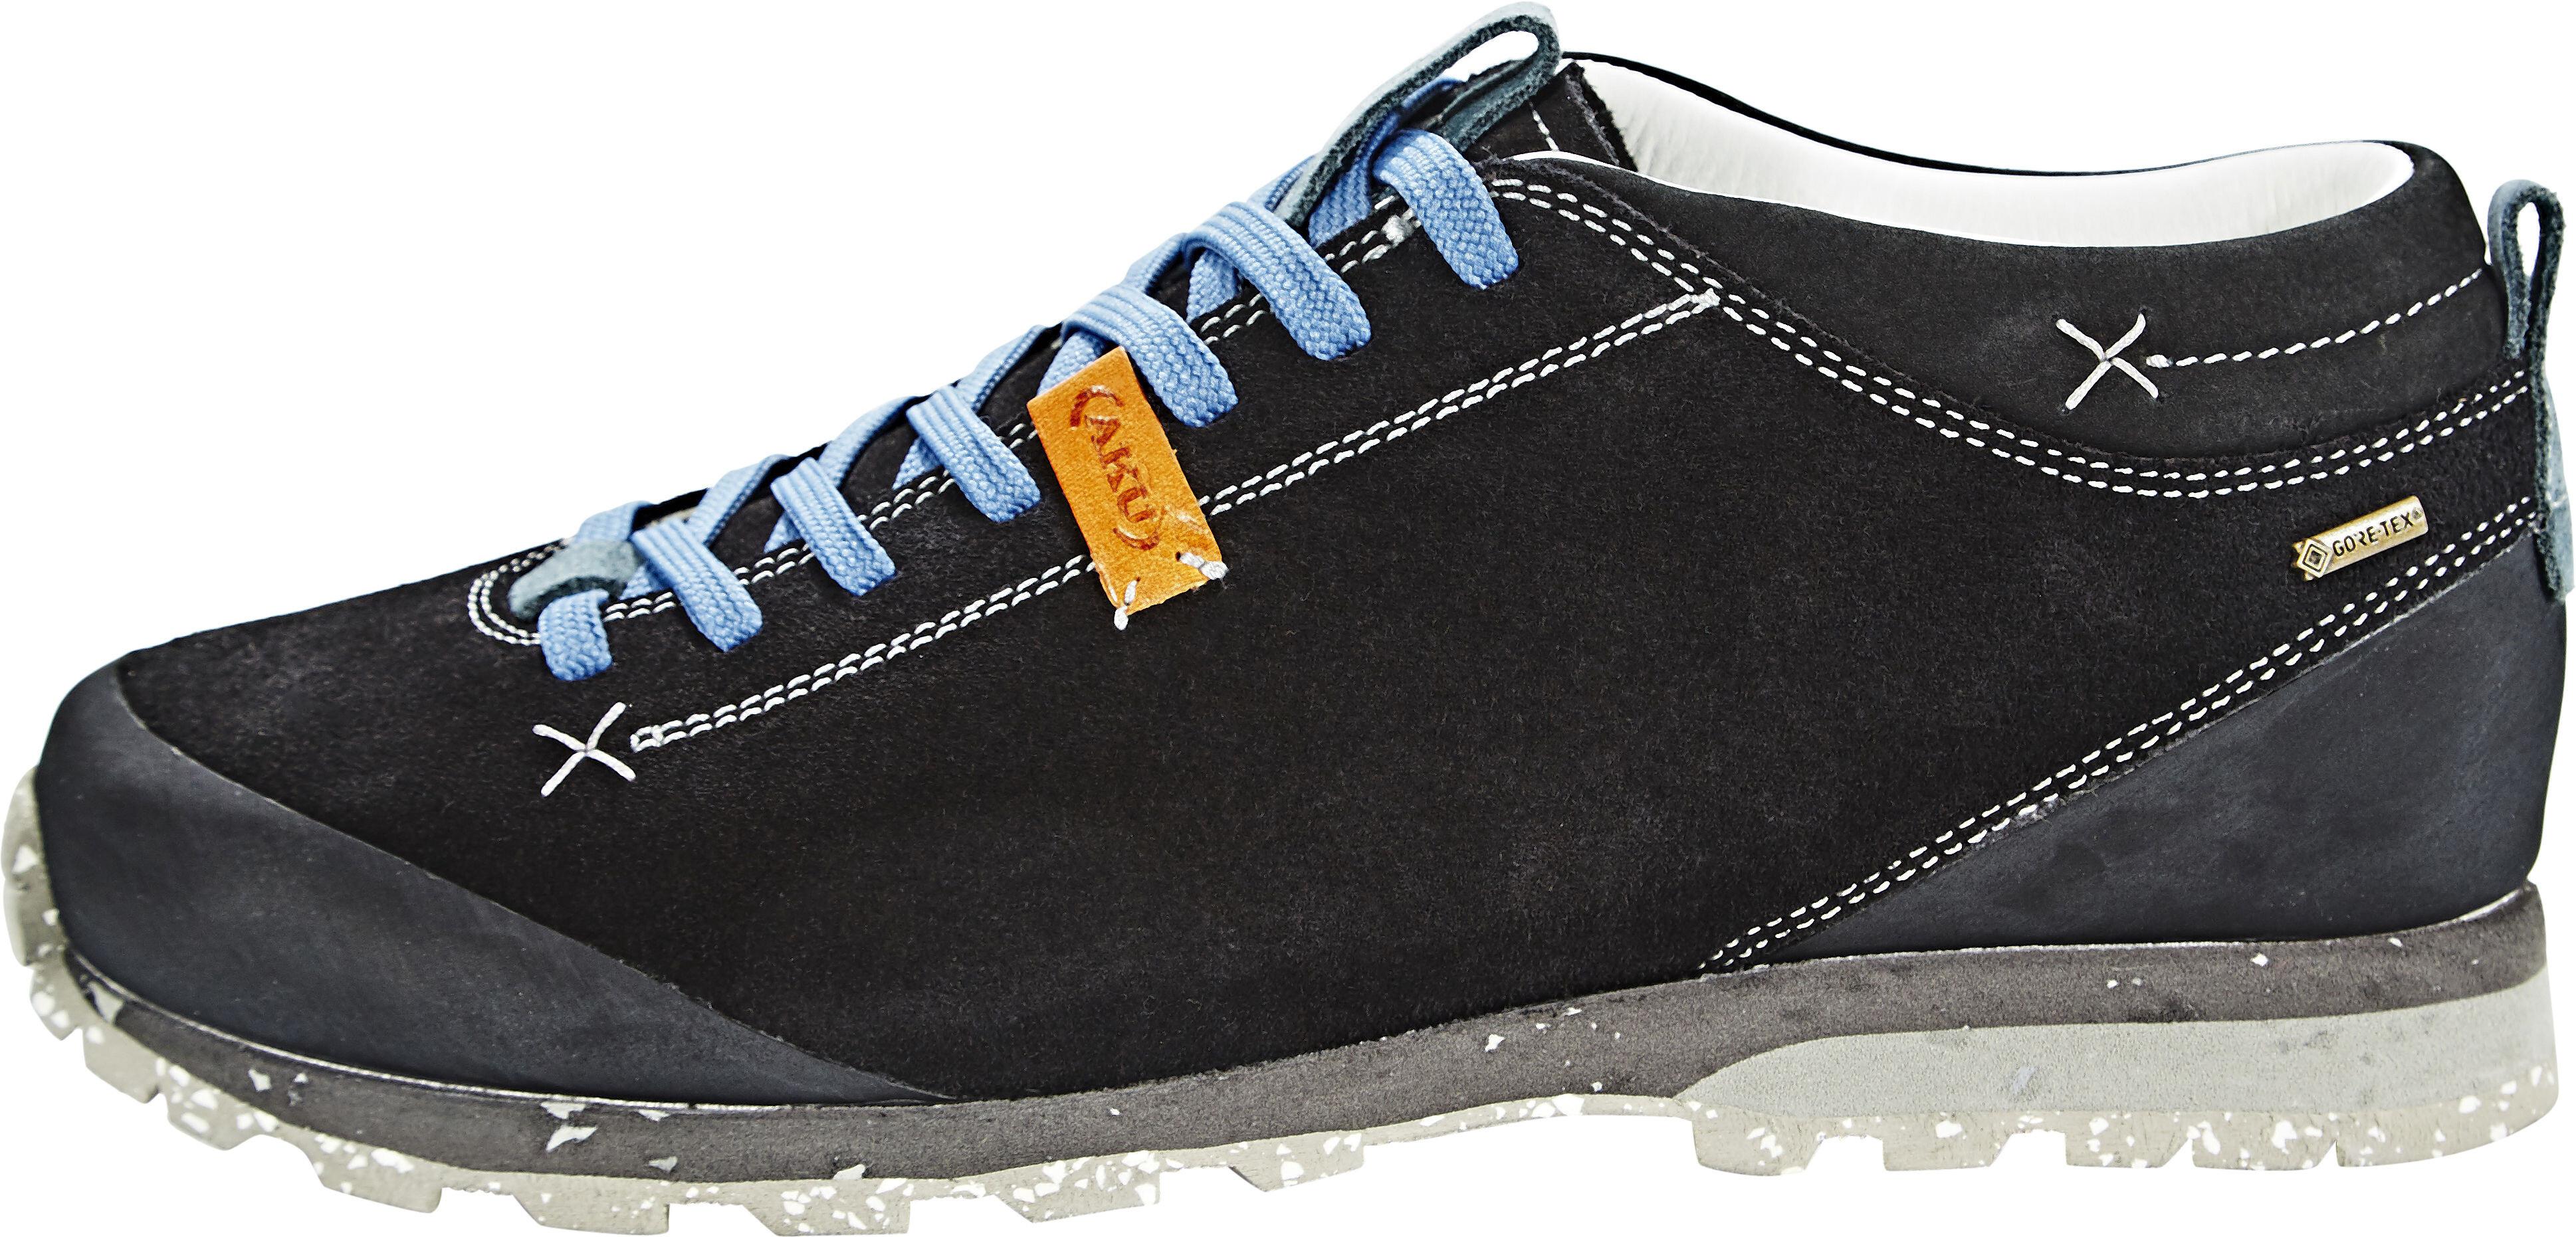 AKU Bellamont Suede GTX Shoes Men black light blue   campz.de fb025d1a2cd0